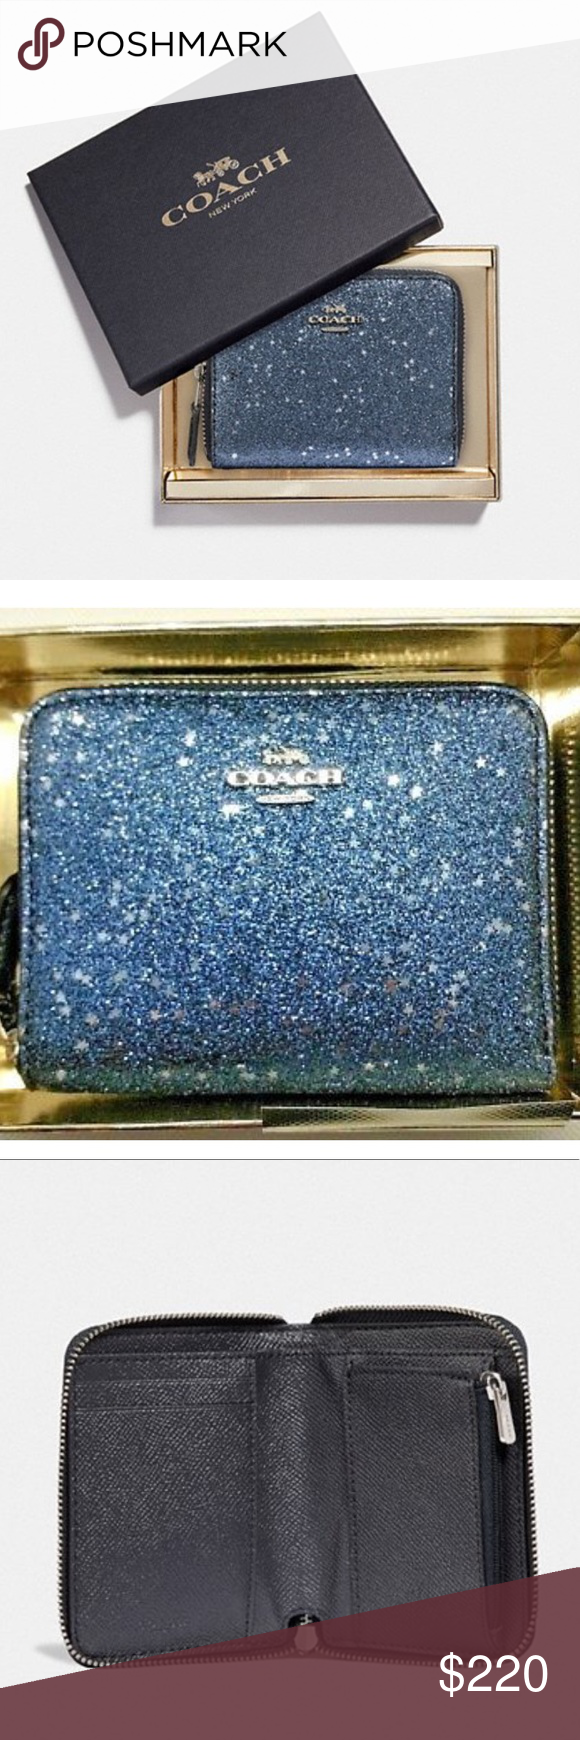 8938240e29a Coach small zip around star glitter wallet F38693 Coach small zip around  Midnight blue silver sparkle